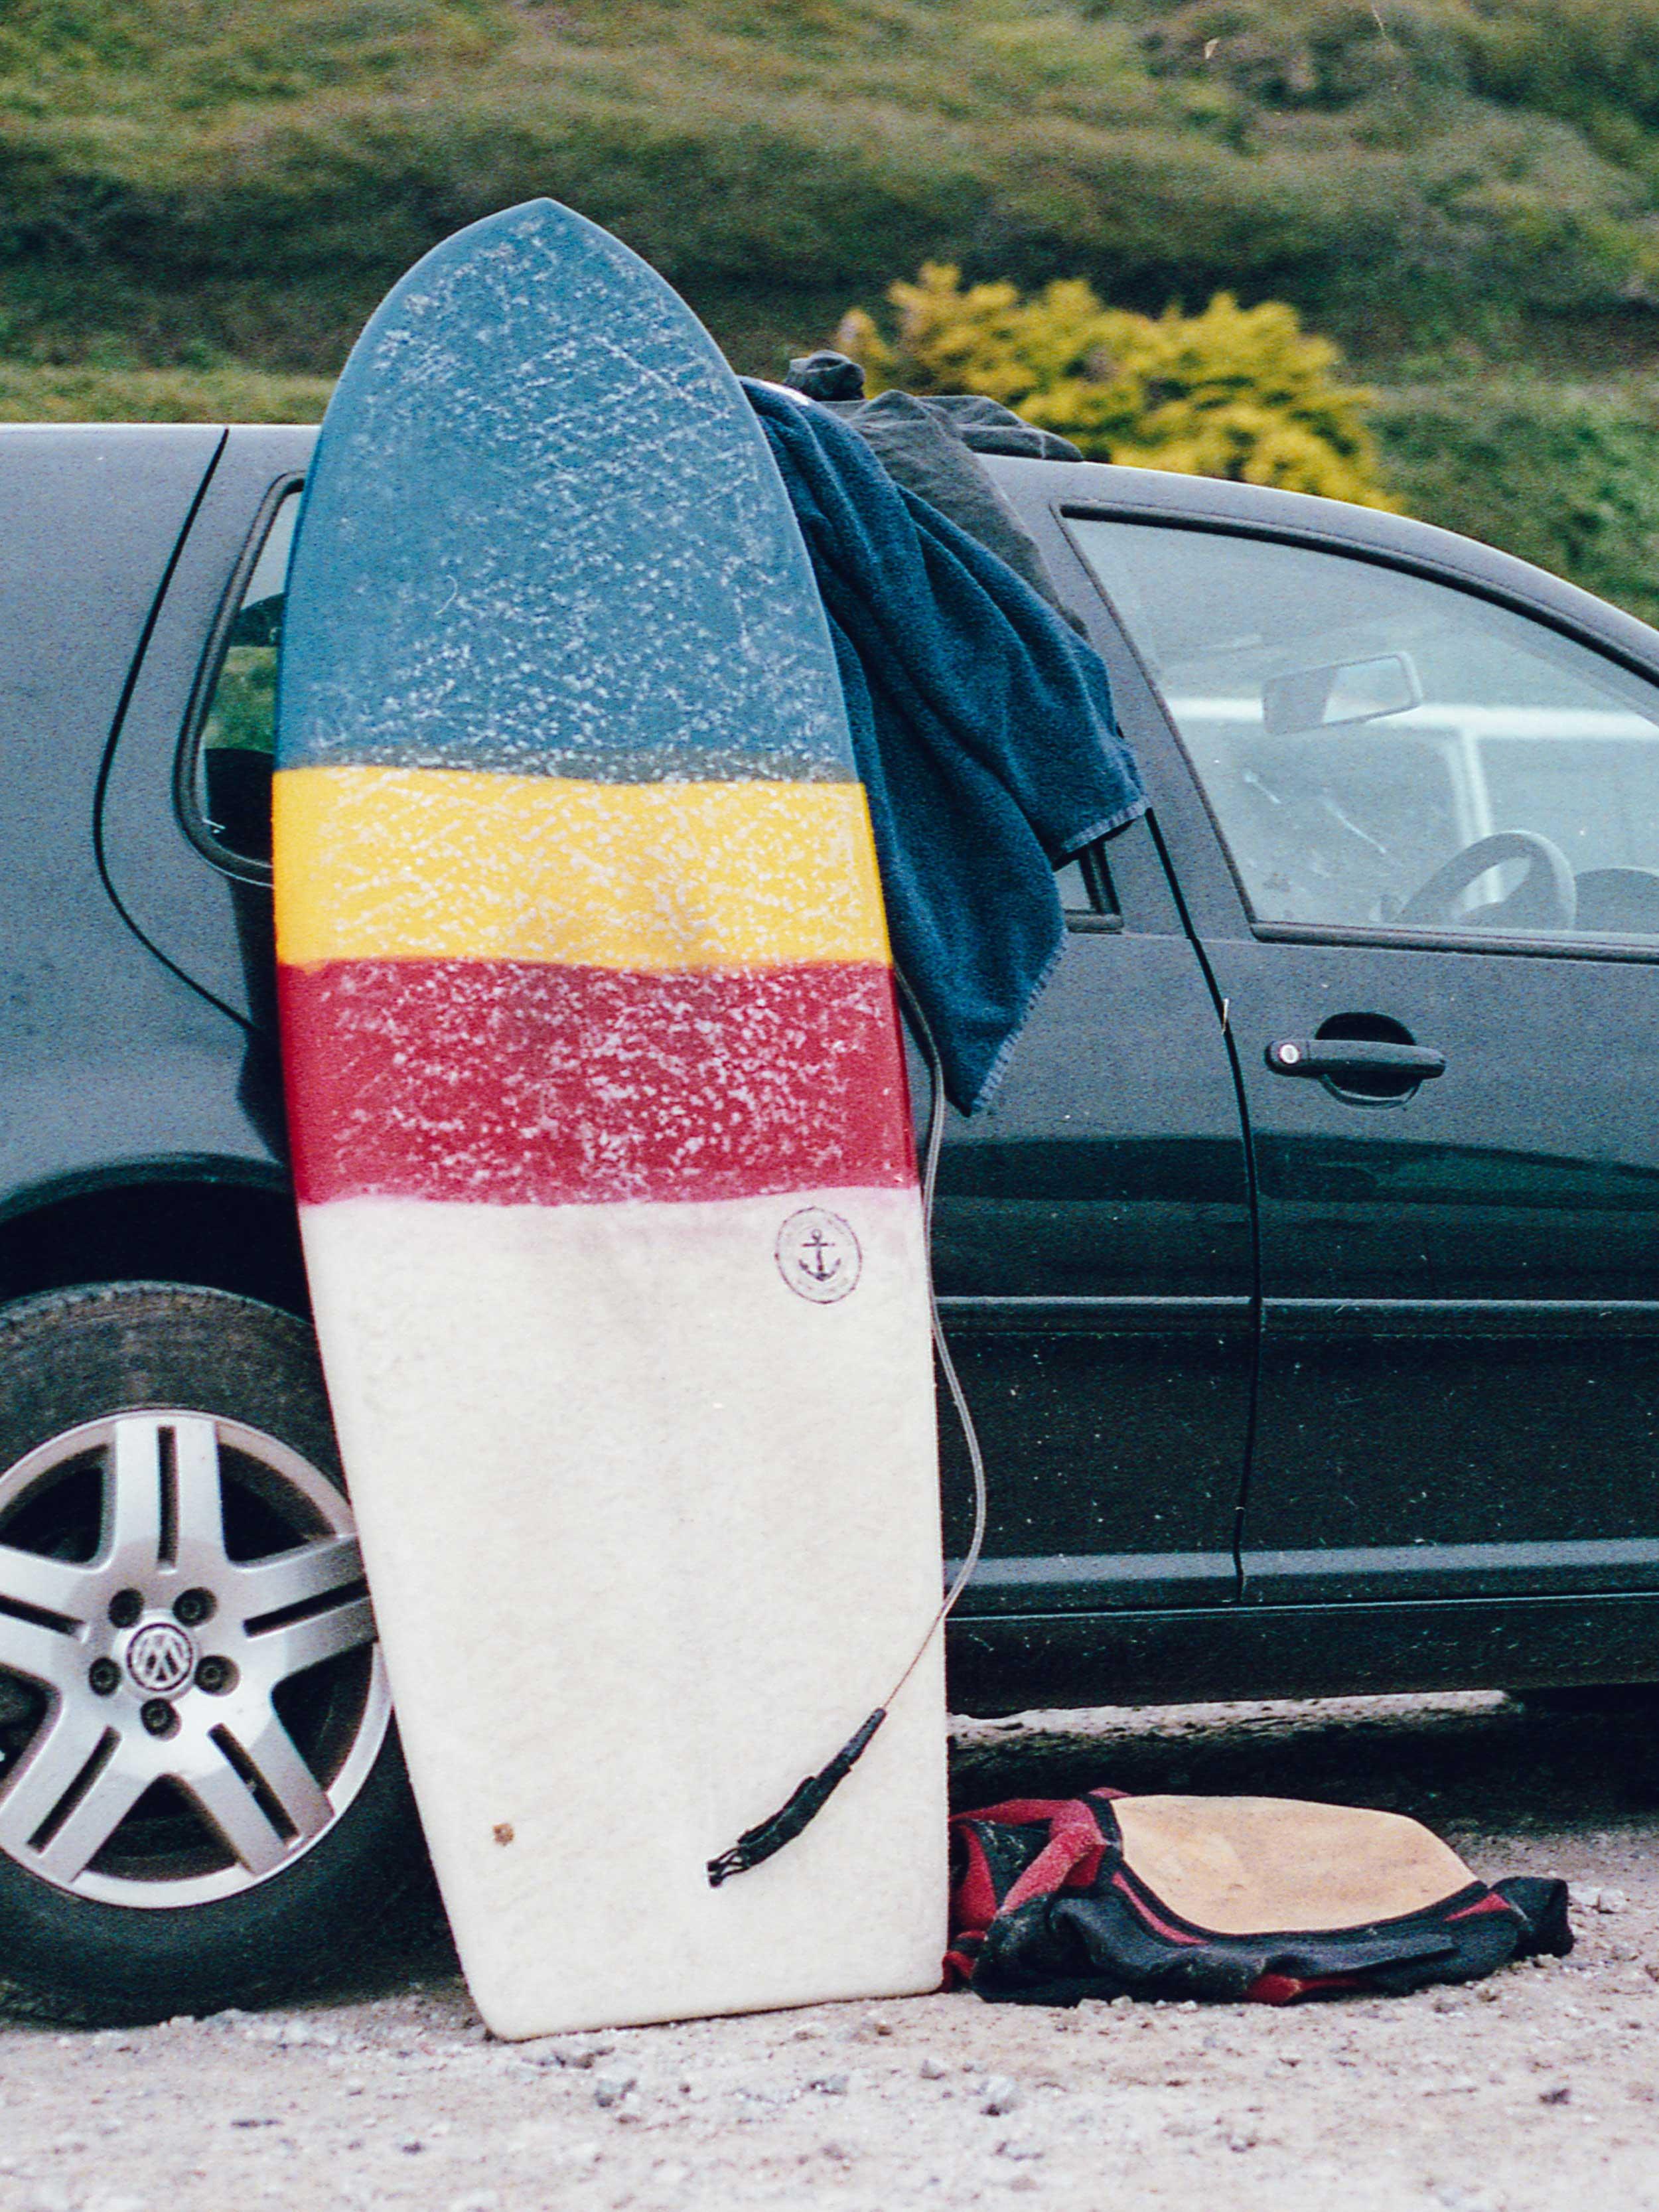 09-24-2018_Surfing-WG-004.jpg